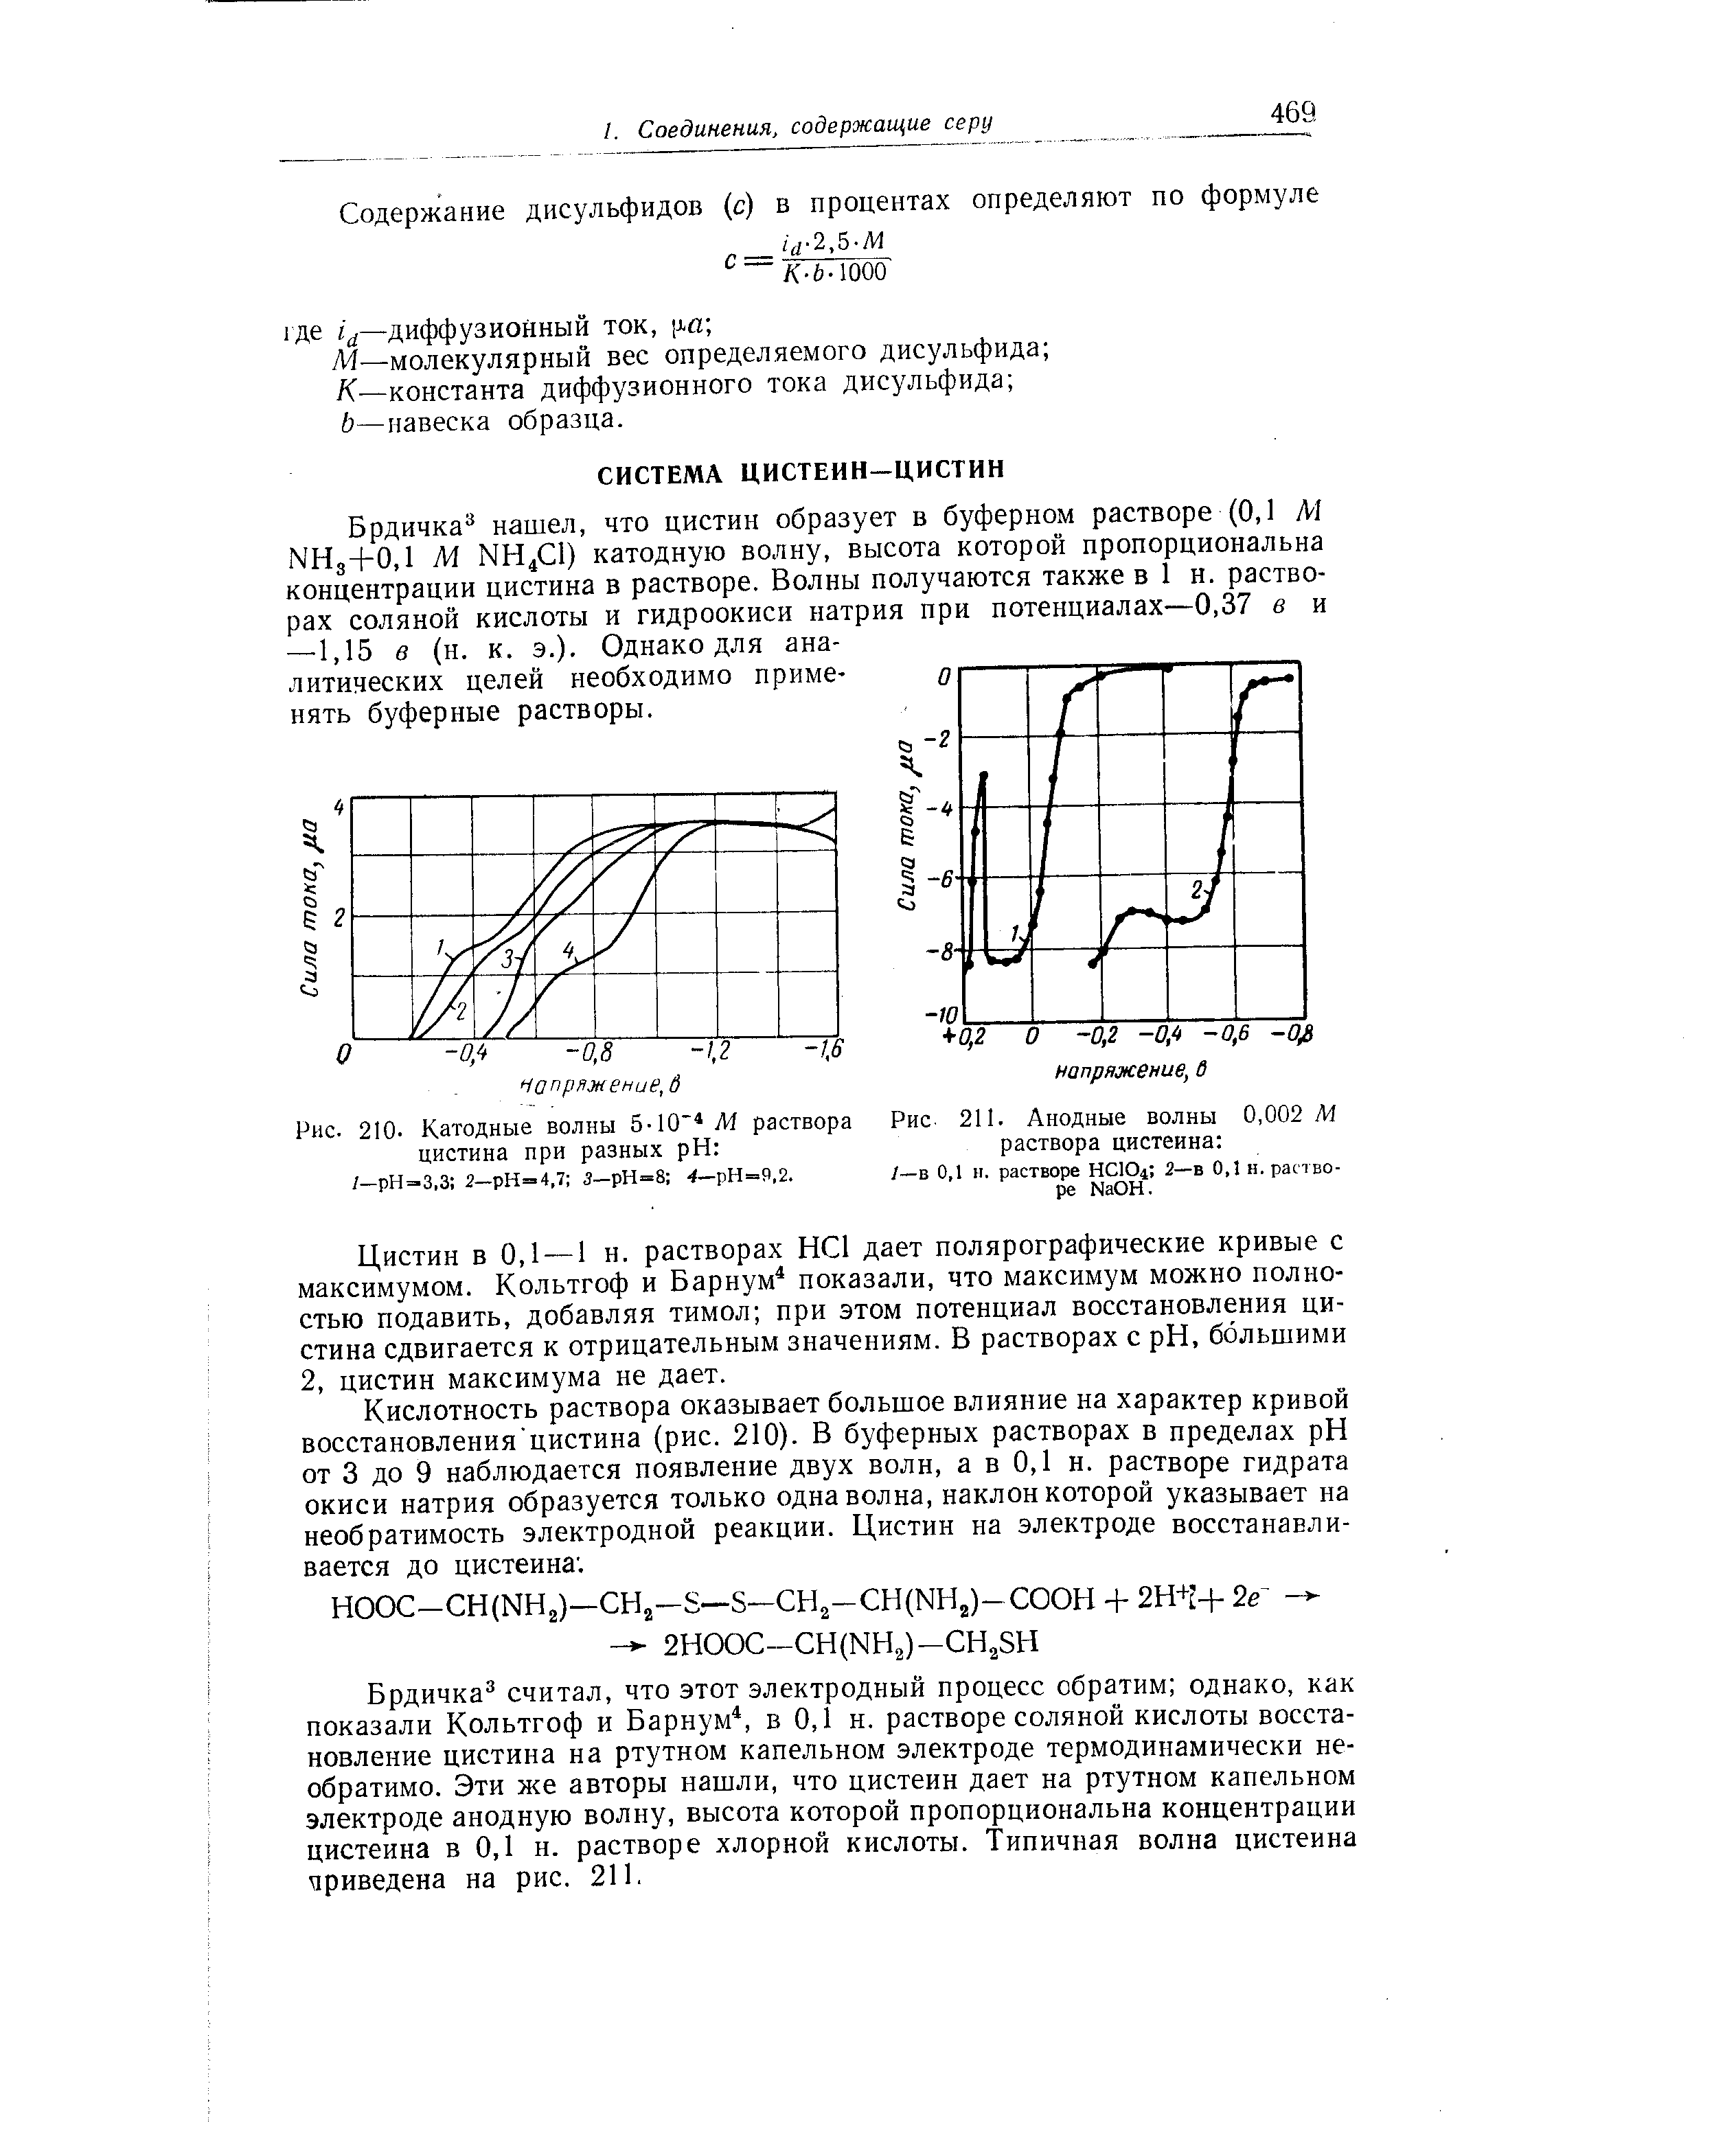 Цистеин [lifebio.wiki]